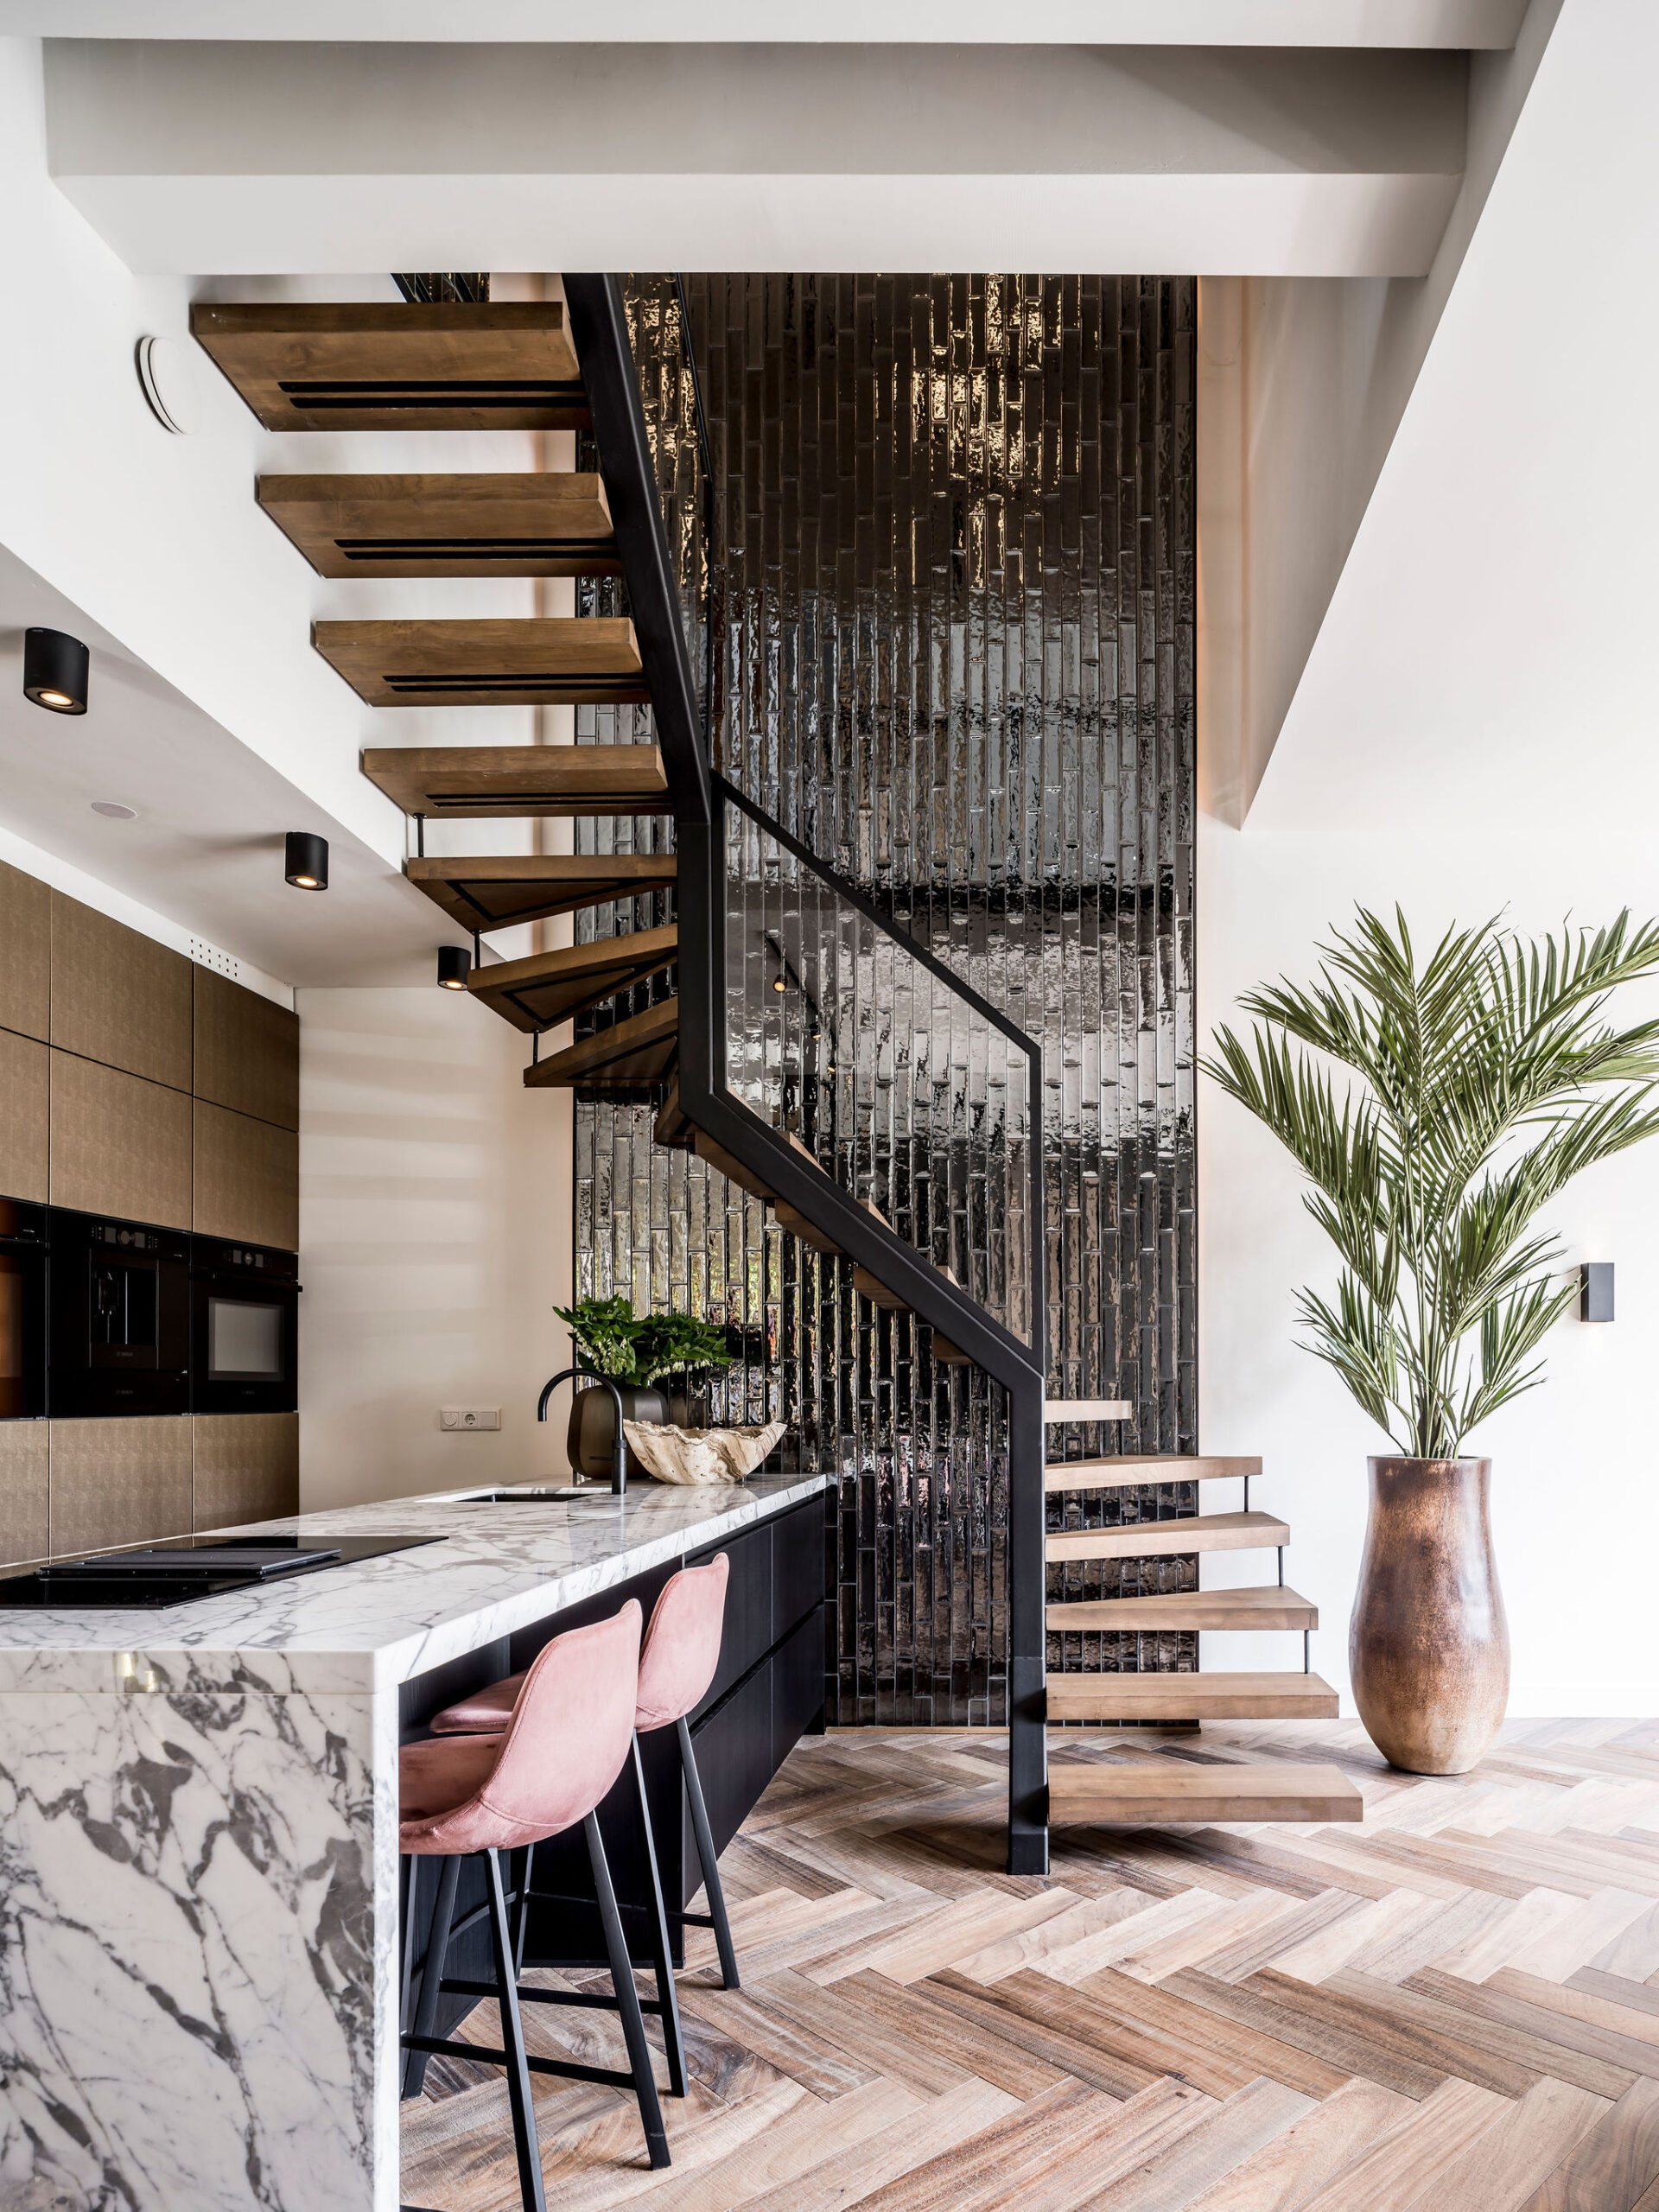 interieurarchitect-Stan-Wildenberg-interieurontwerp-interieur-interiordesign-luxurylifestyle-luxuryinteriors-luxuryhomes-keuken-marmerblad-Baas-Photography-styling-Jongerius